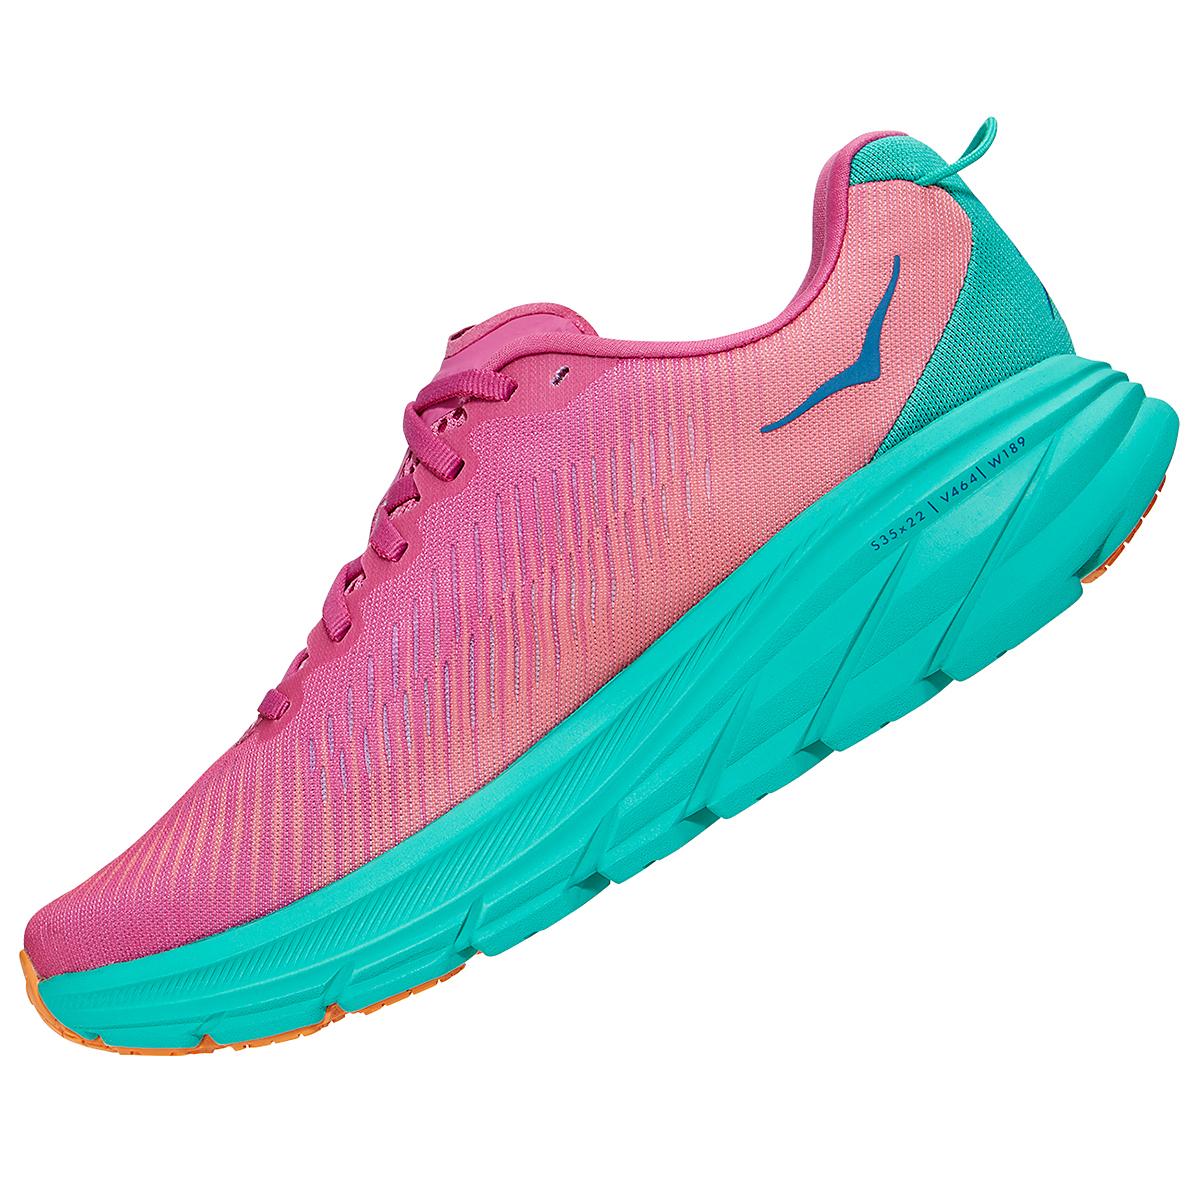 Women's Hoka One One Rincon 3 Running Shoe - Color: Phlox Pink/Atlantis - Size: 5 - Width: Regular, Phlox Pink/Atlantis, large, image 4